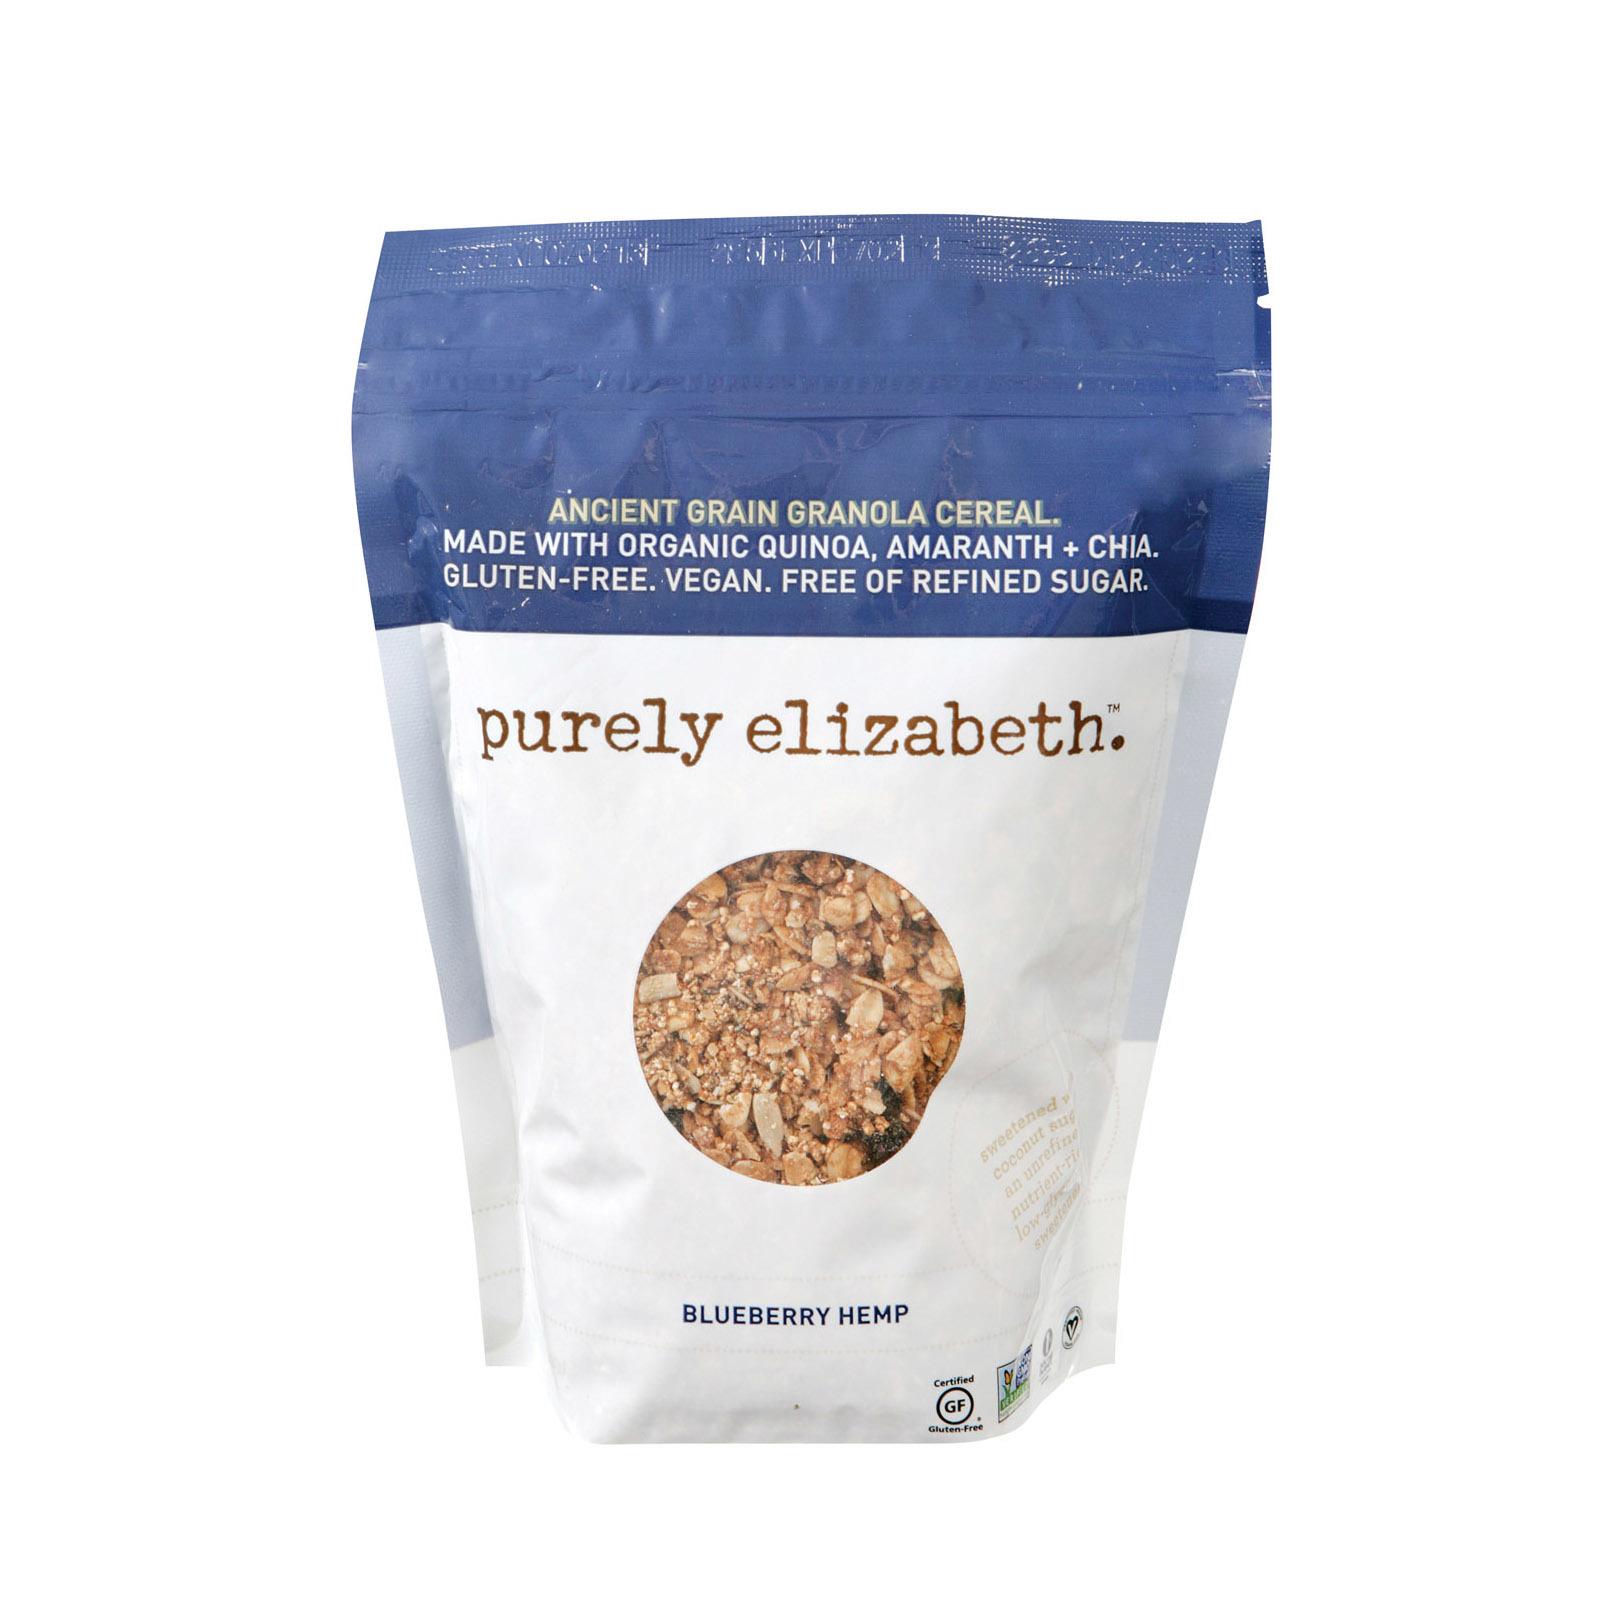 Purely Elizabeth Organic Ancient Grain Granola - Blueberry Hemp - Case of 6 - 12 oz.